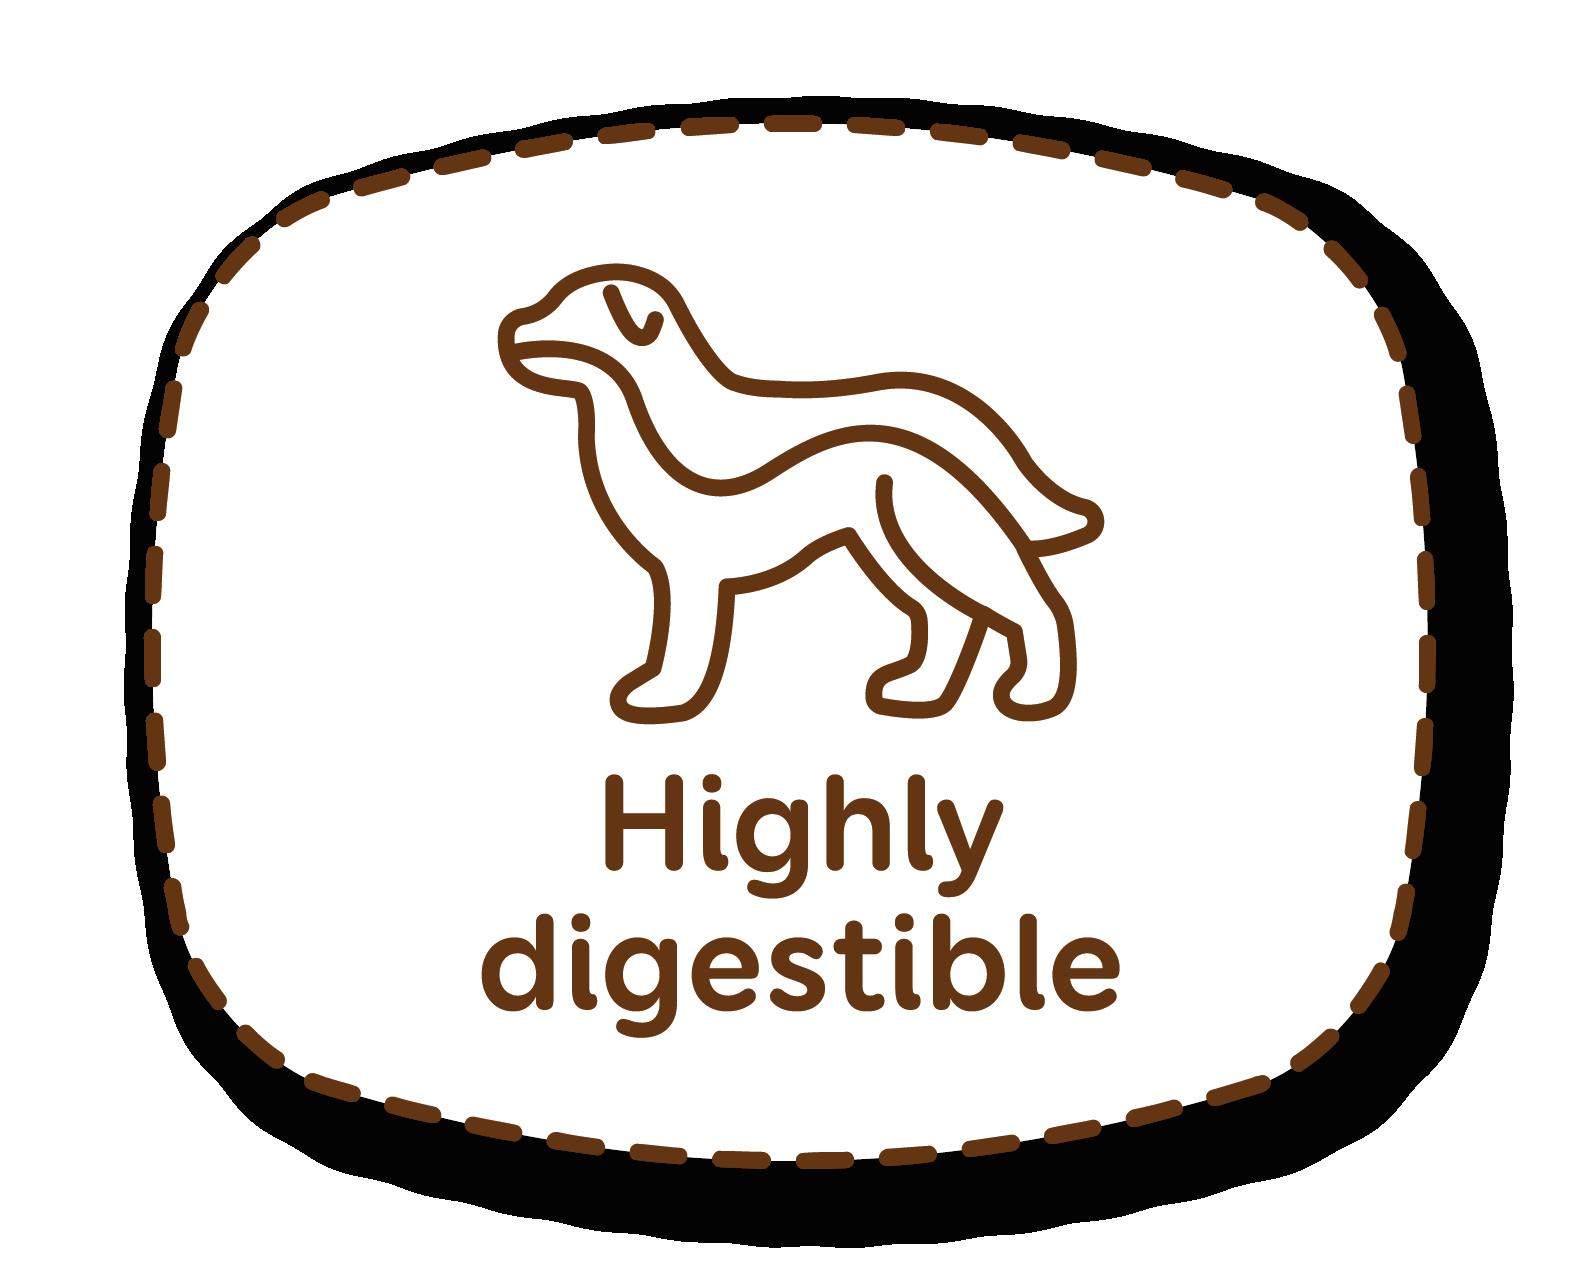 Alta digestibilidad